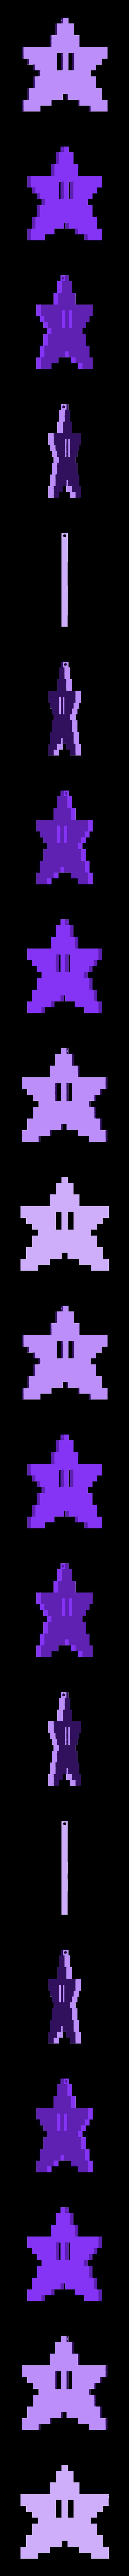 MarioStar_v2.stl Download free STL file Pixel Star from Mario Bros games. • 3D printer model, Tramgonce